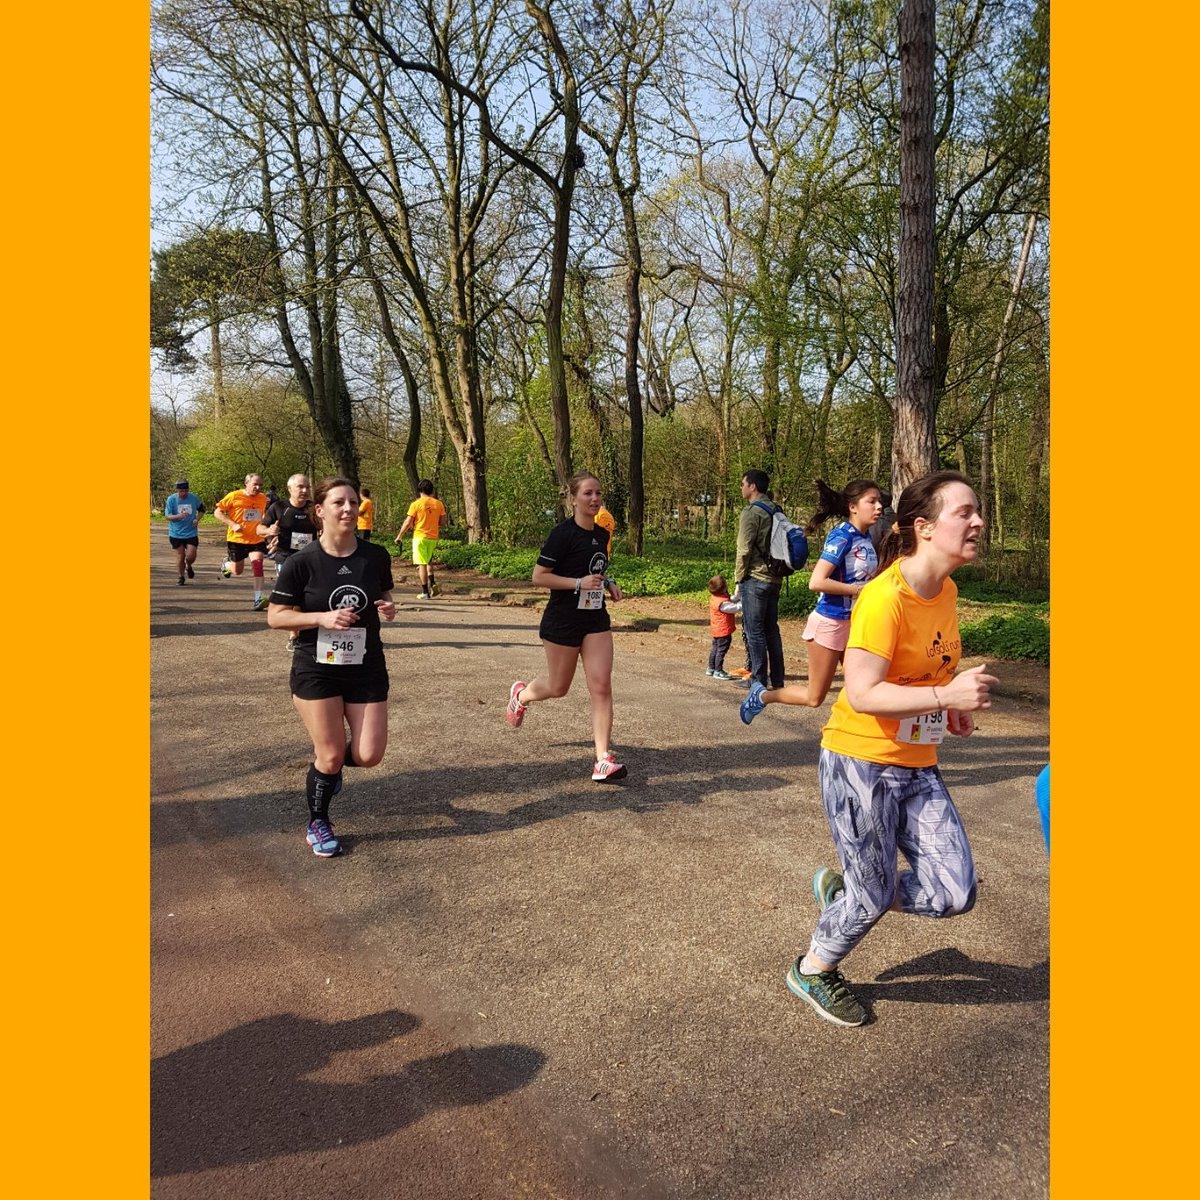 Arrivée des championnes du 10k de la #soli&#39;run Une belle #MorningRace #whyirunjaures #adidasrunnersleague #running <br>http://pic.twitter.com/yip3AJFPtd